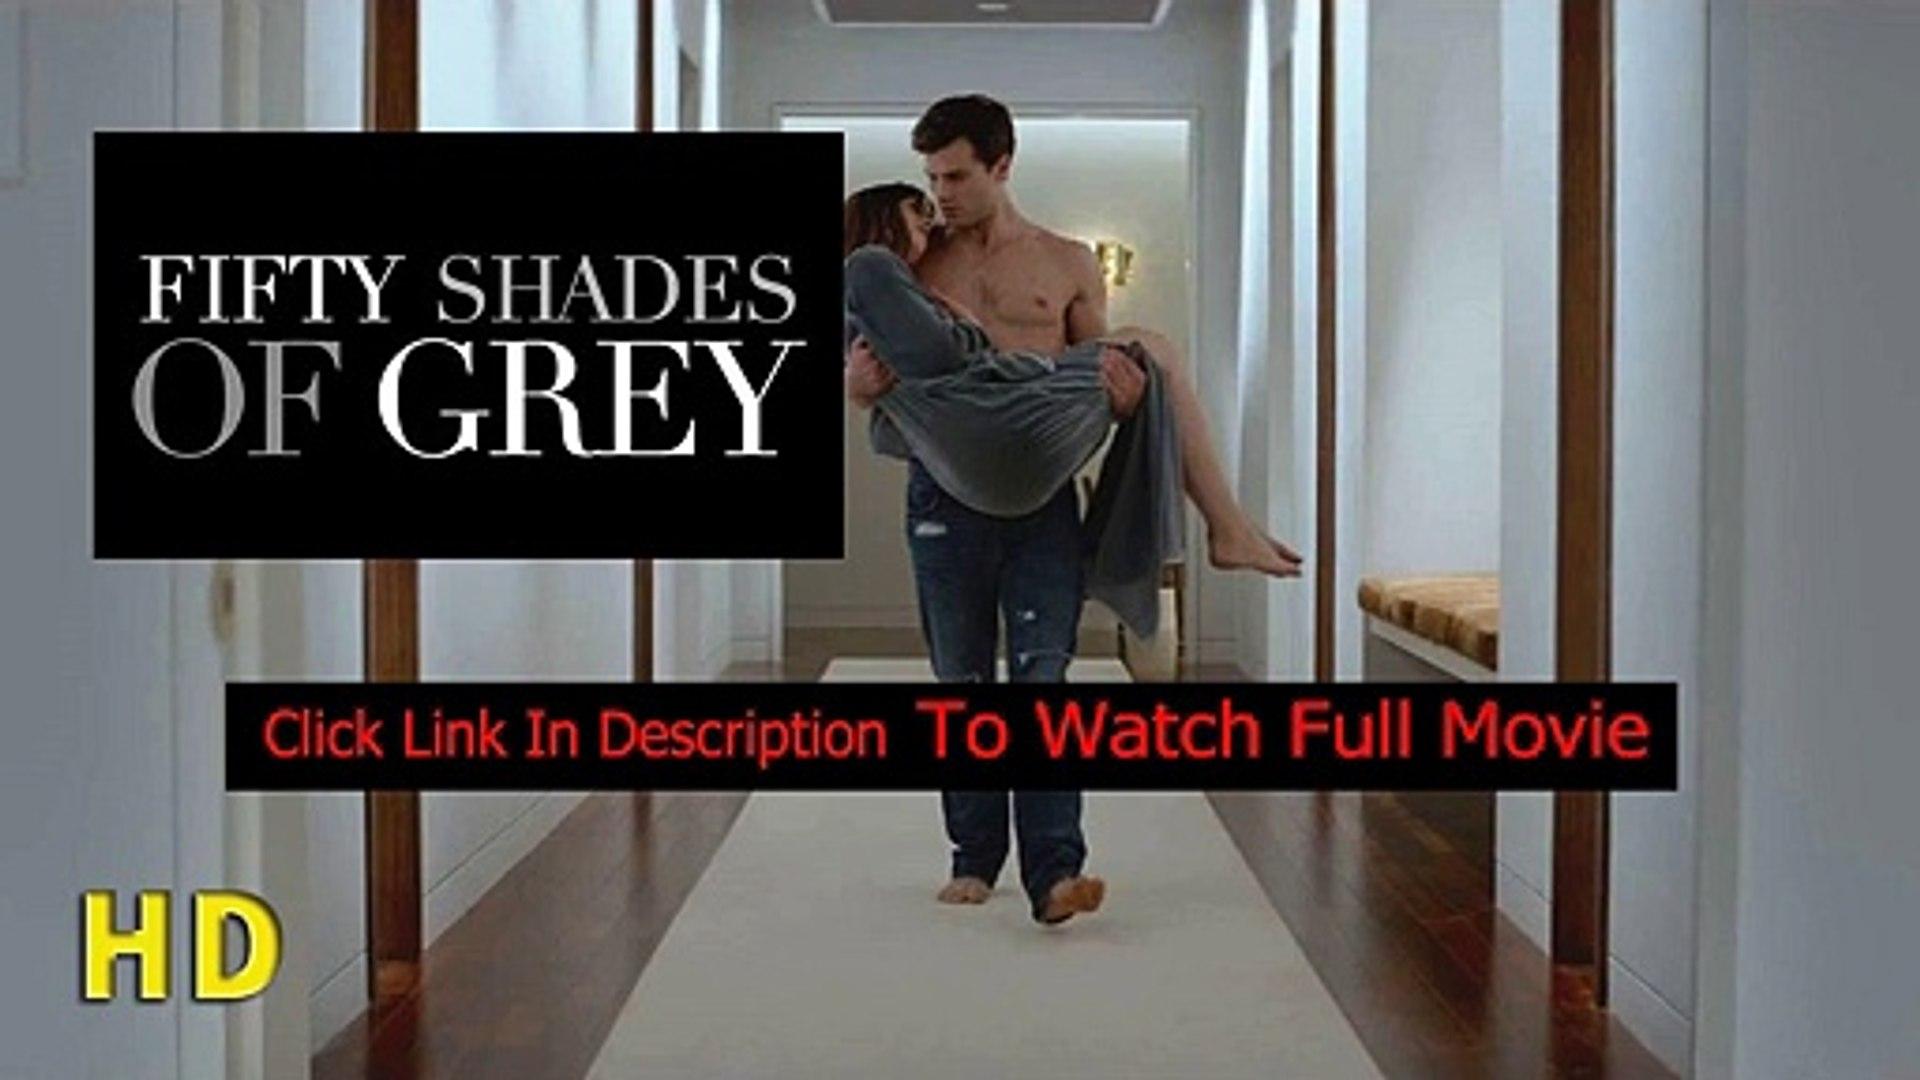 Grey 50 shades german stream of online Fifty Shades